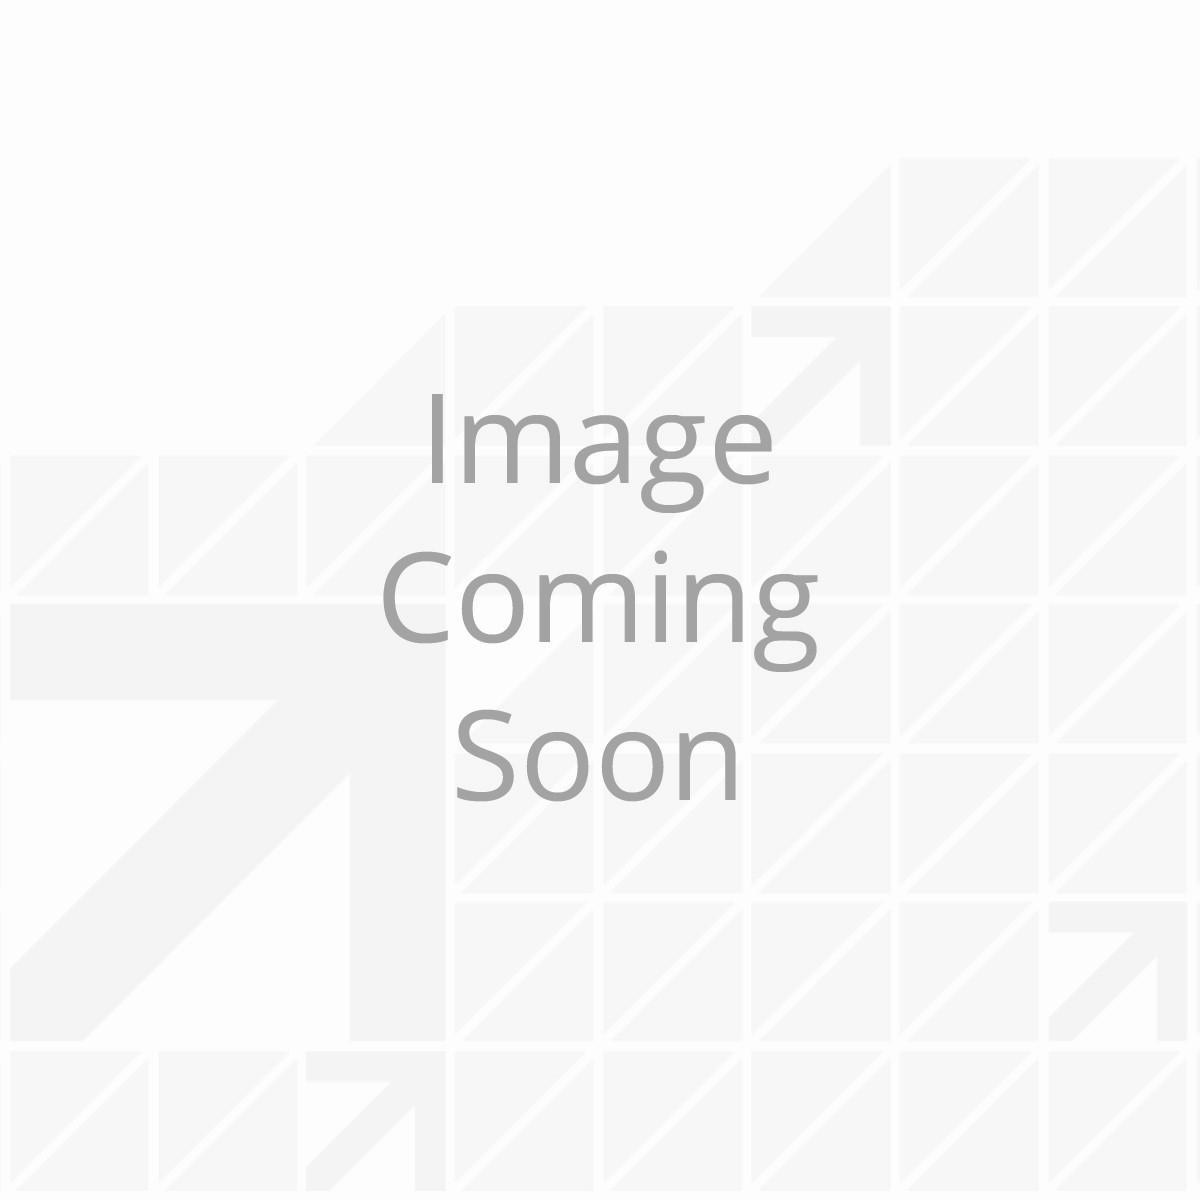 High-Speed Motor and Switch (Tuson) Kit - Landing Gear